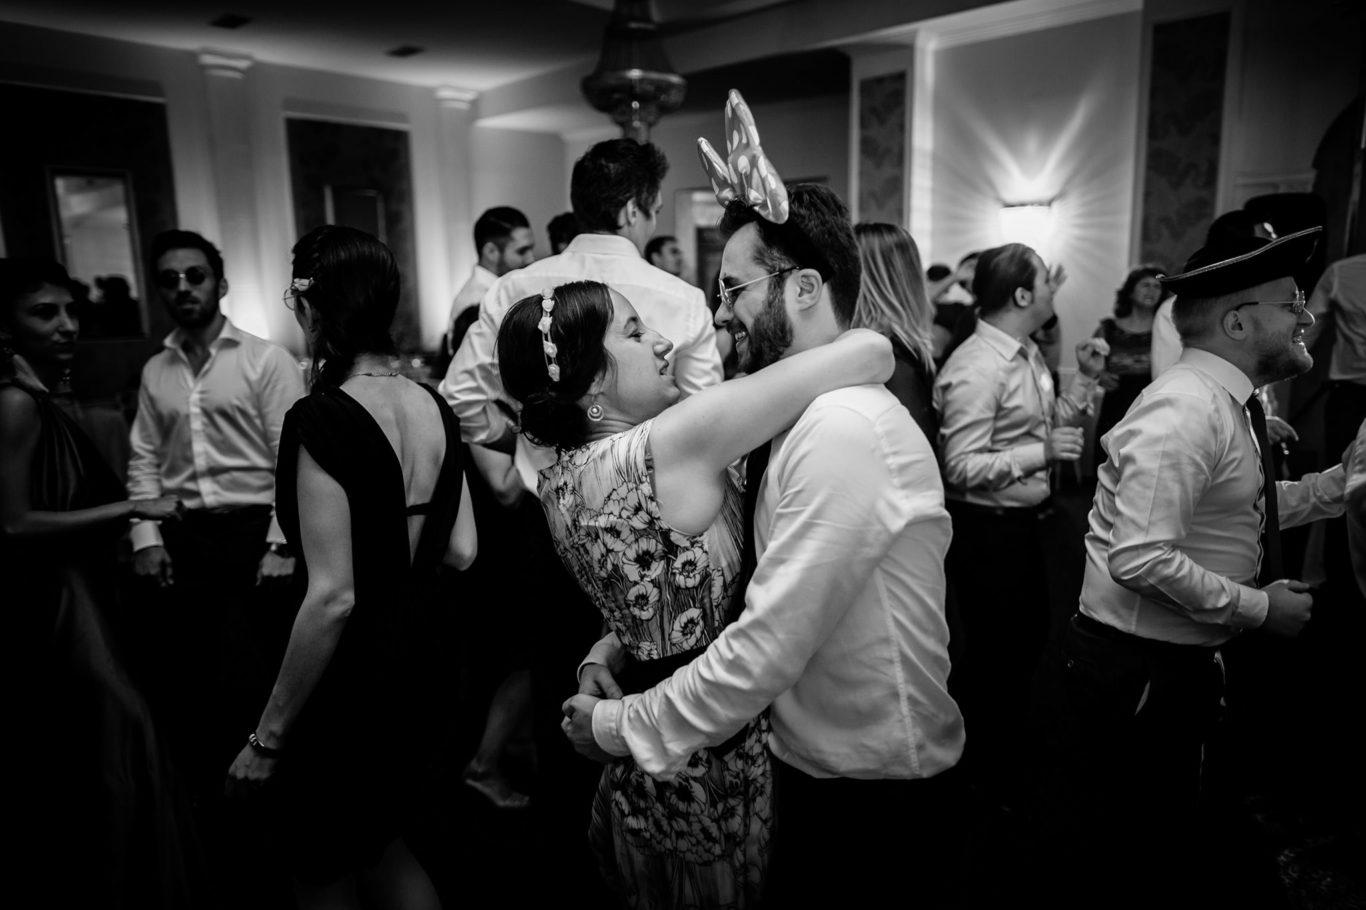 0653-fotografie-nunta-bucuresti-cristina-nicusor-fotograf-ciprian-dumitrescu-dc1_0402